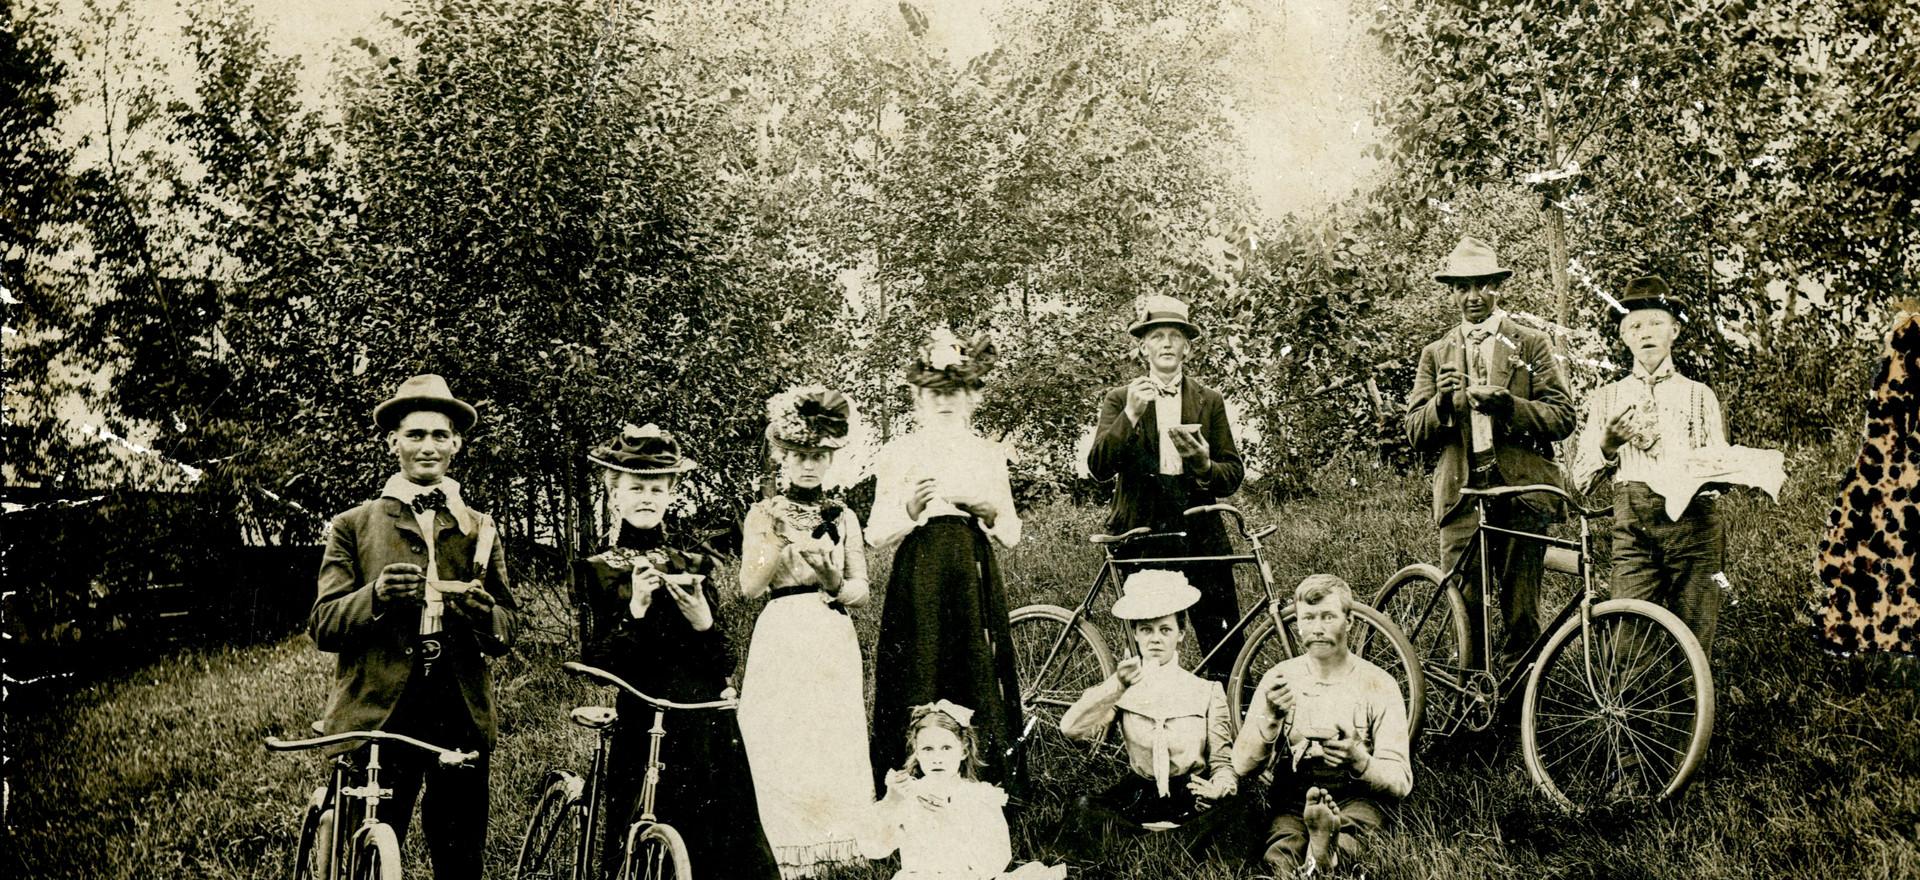 Historic Photo. Bicycle picnic - Scandia, MN ca. 1910